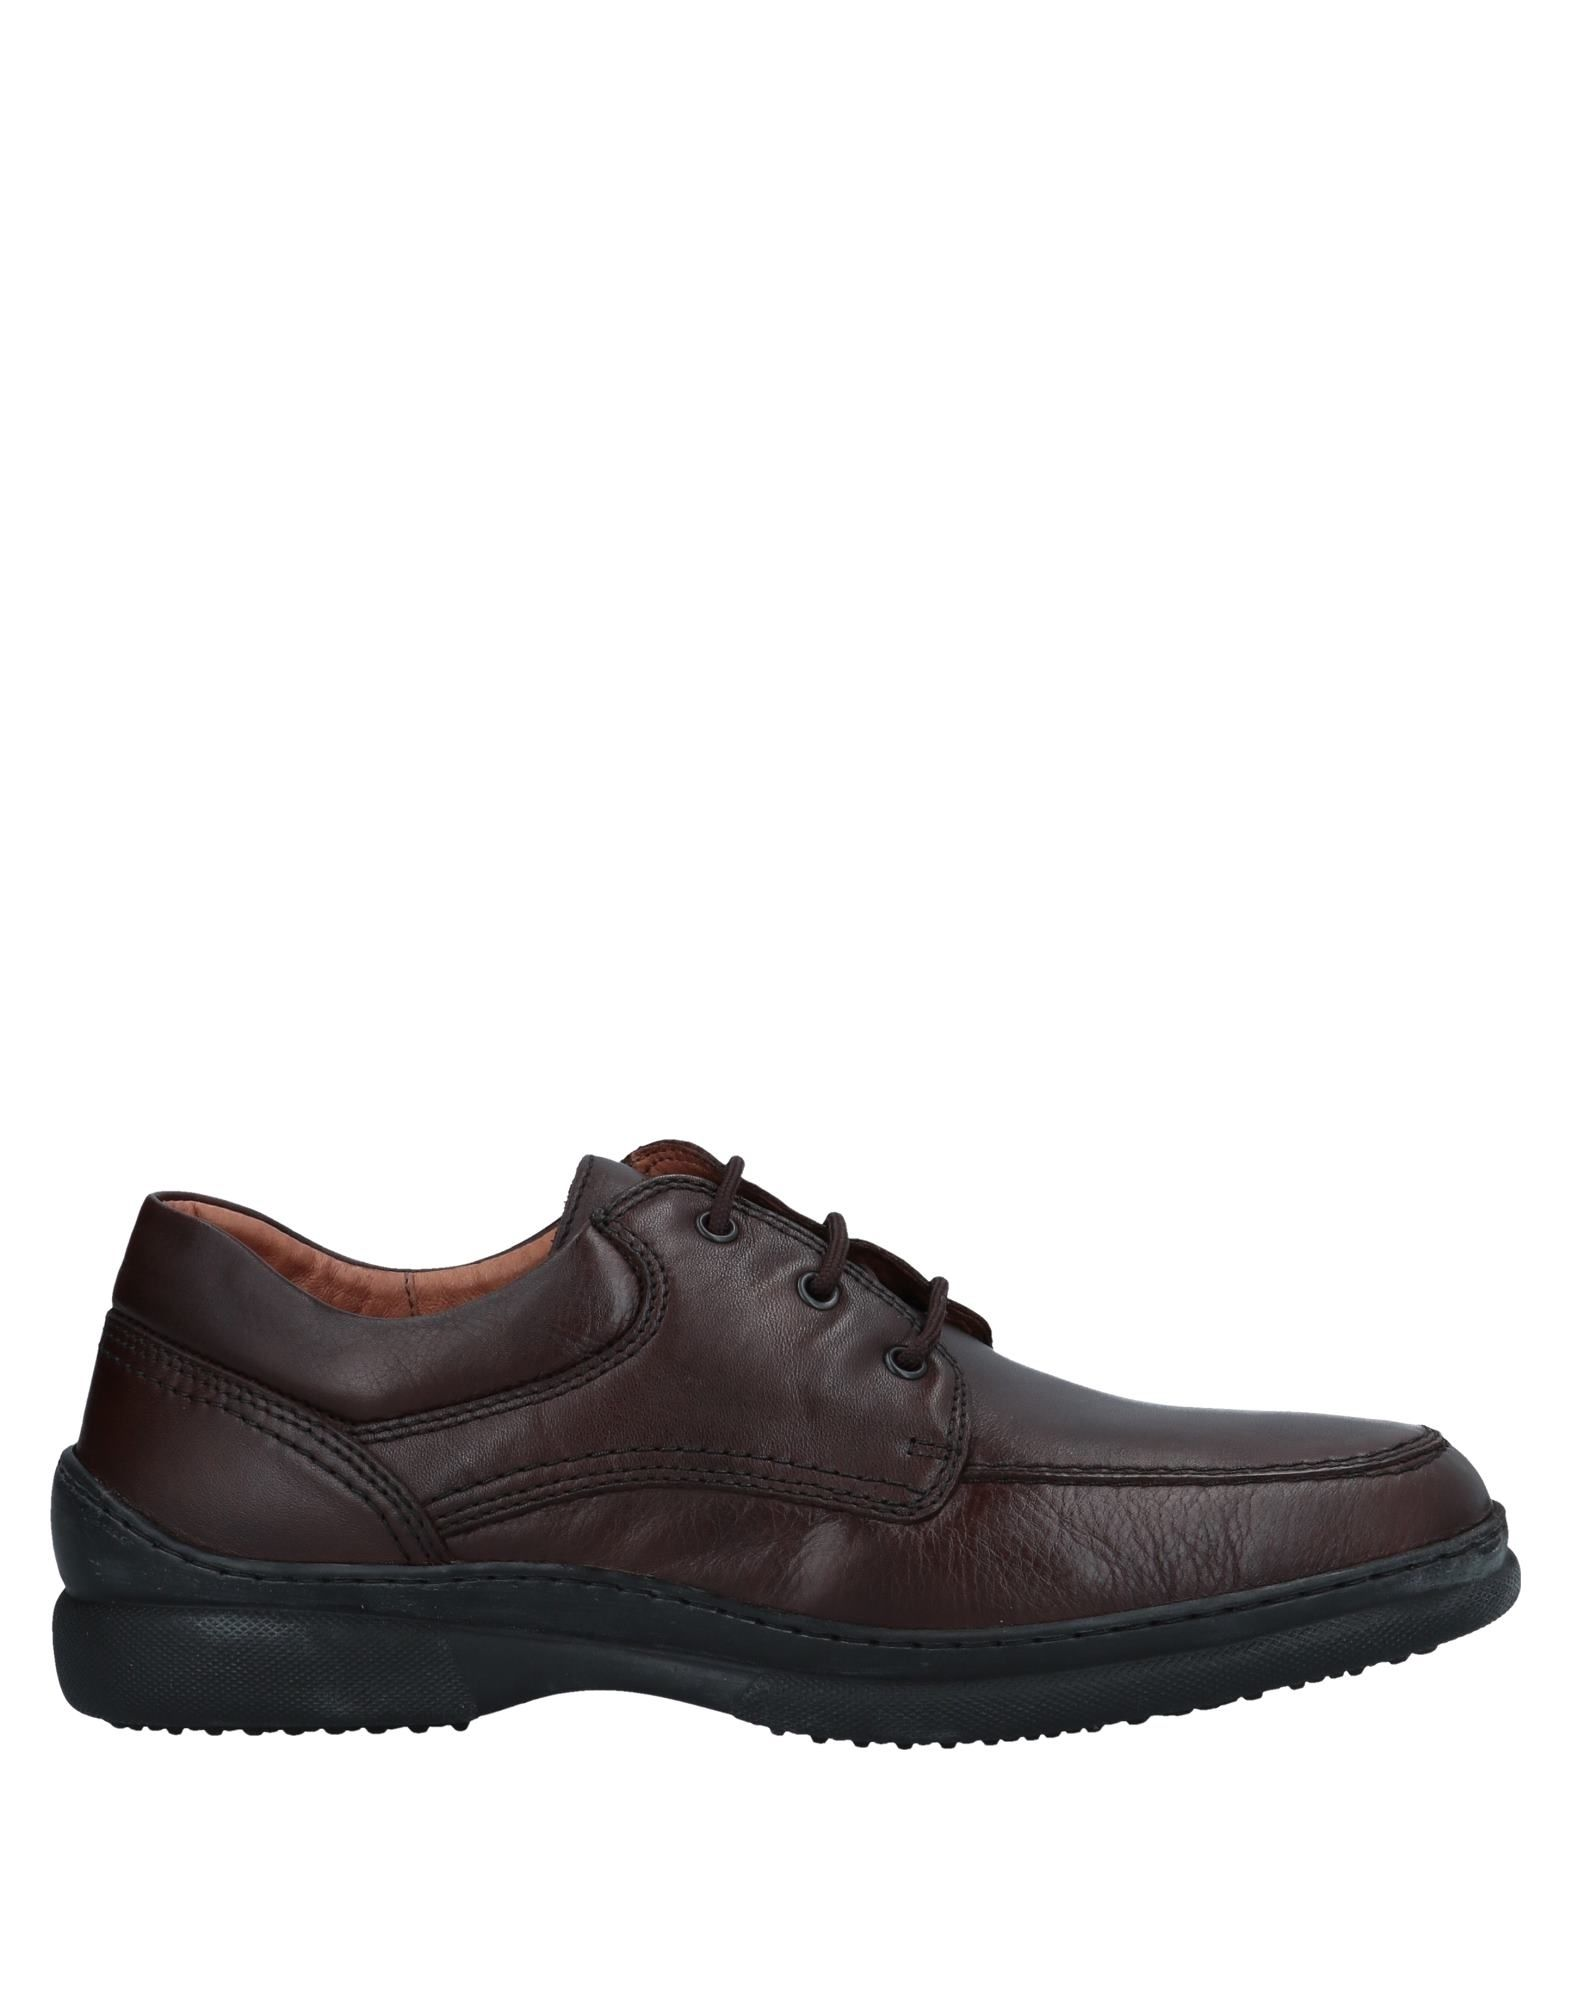 Rabatt echte Schuhe Valleverde Schnürschuhe Herren  11551703FI